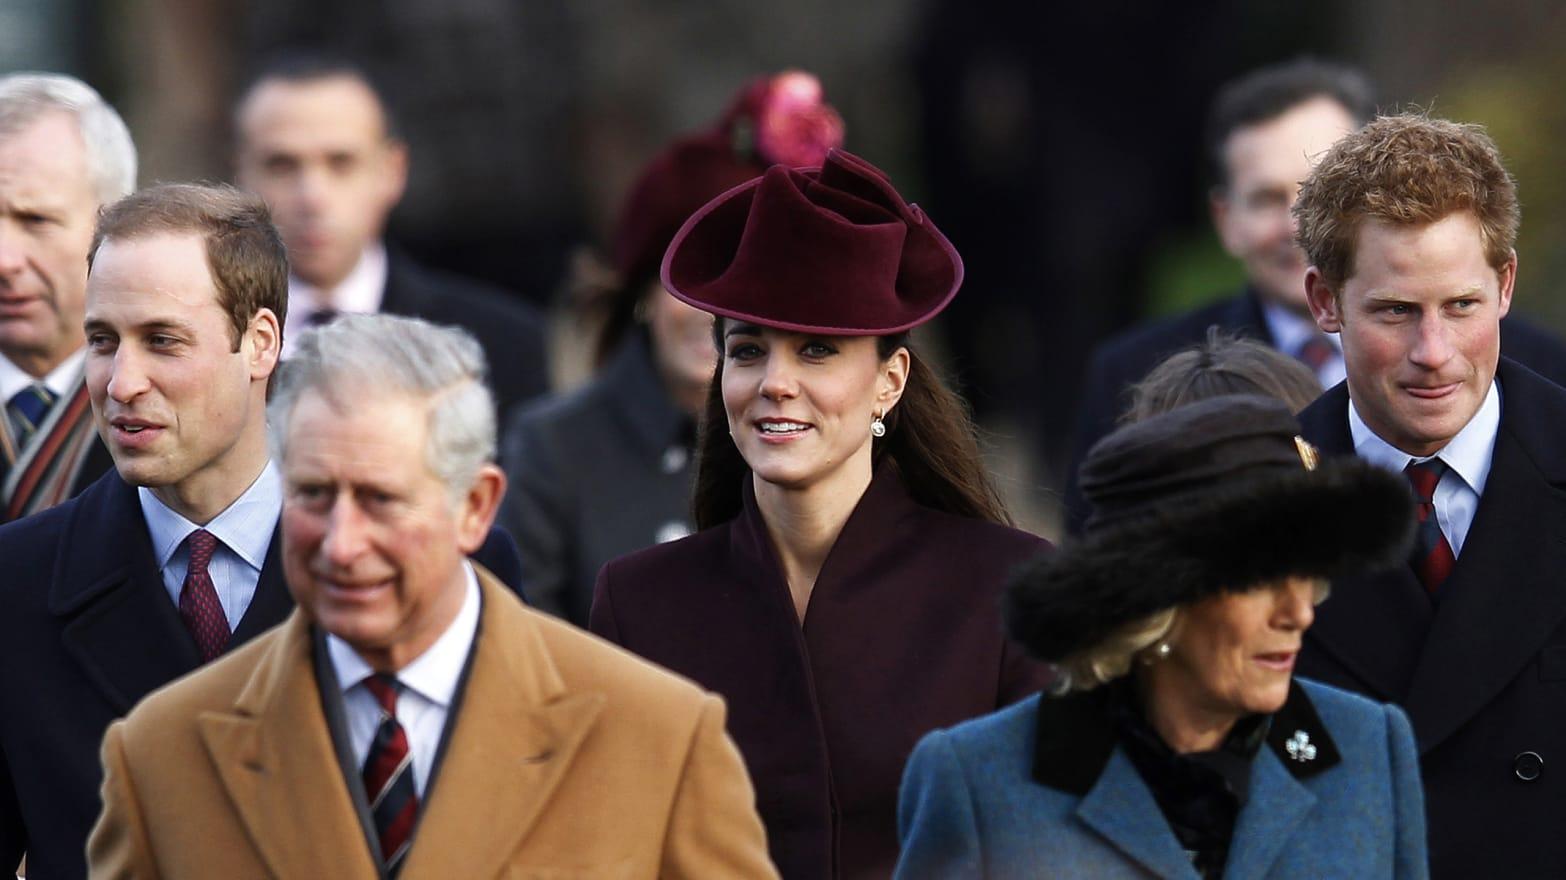 Royal Christmas.How Kate Middleton Revolutionized The Royal Christmas